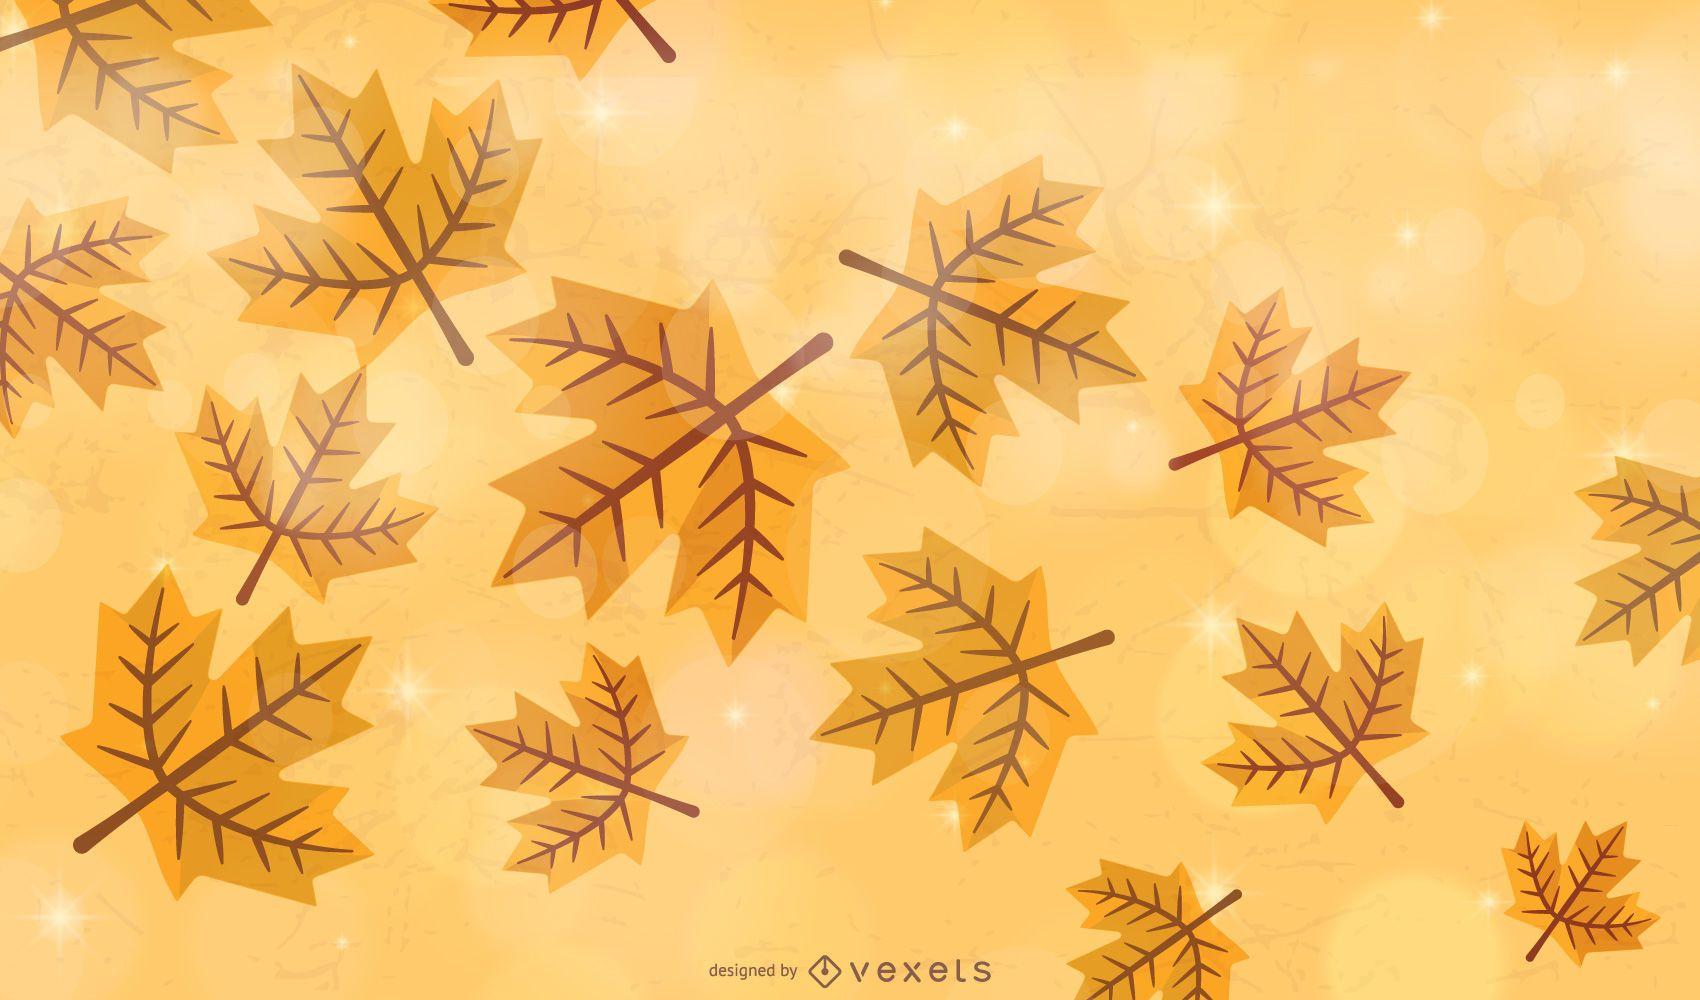 Golden autumn leaves background